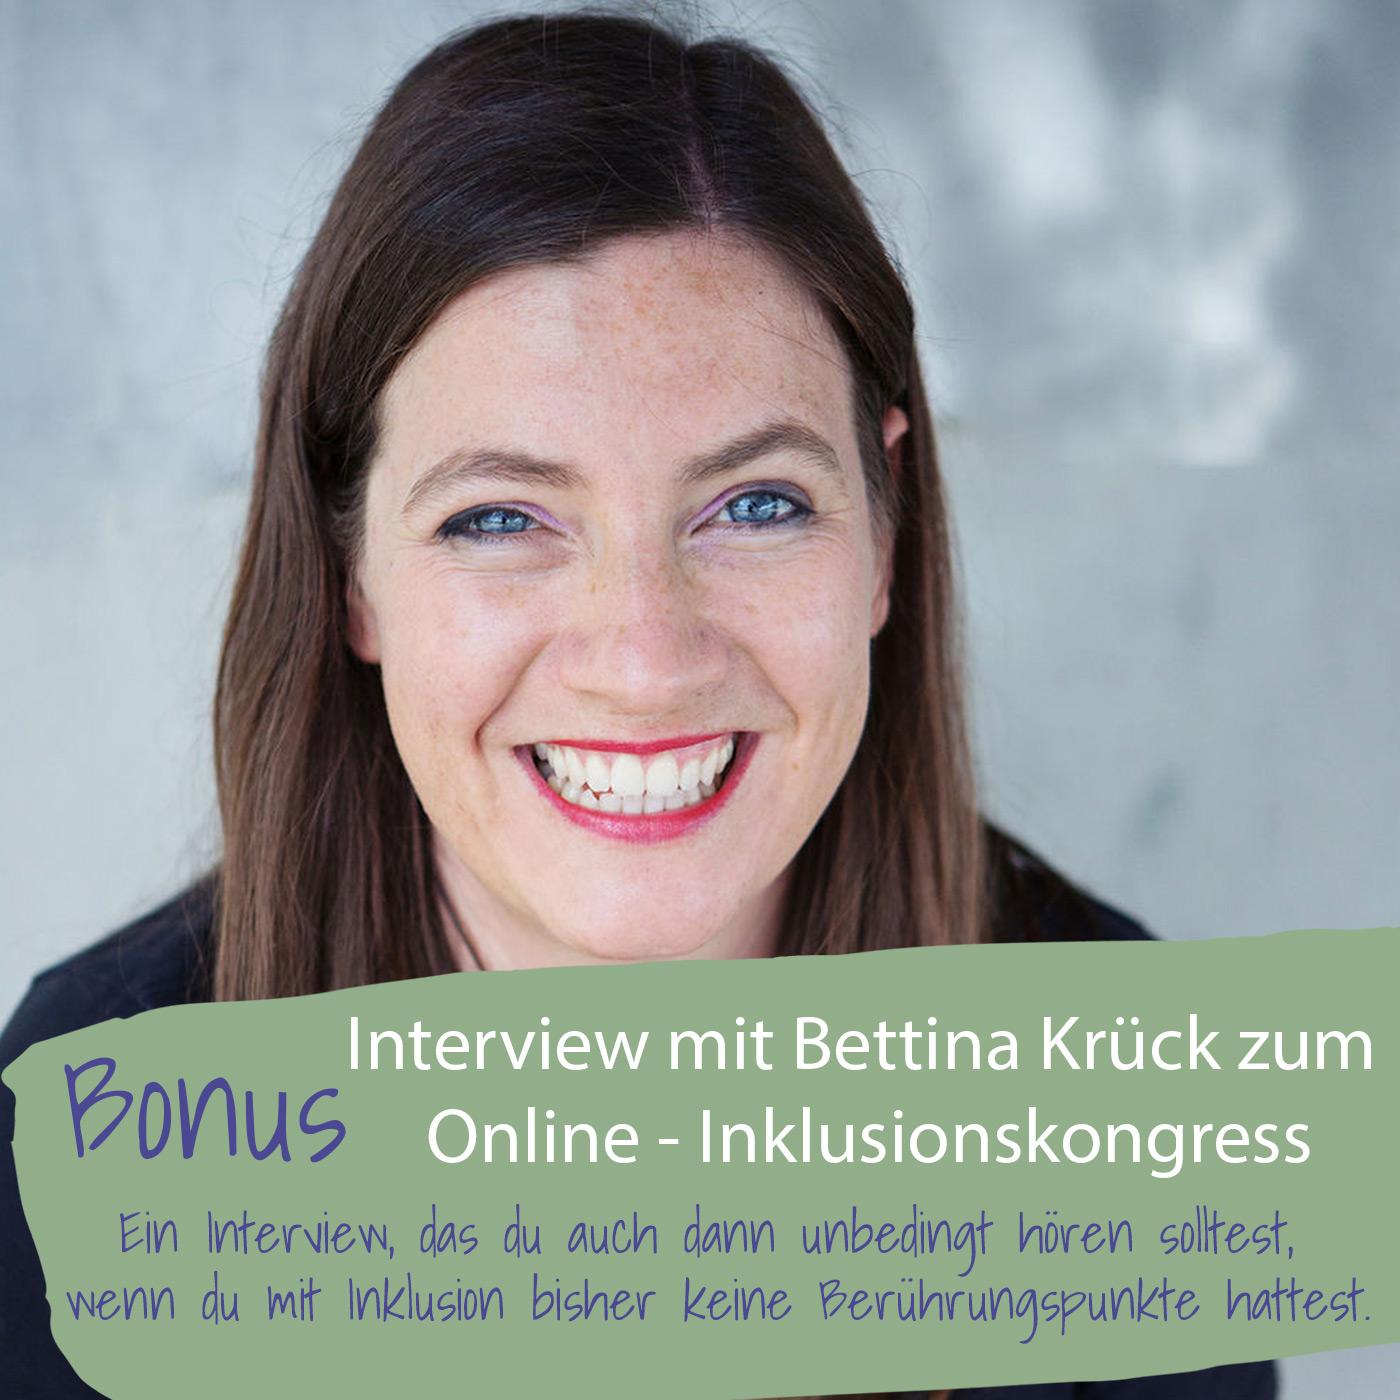 Bonusfolge006: Interview zum Online-Inklusionskongress mit Bettina Krück